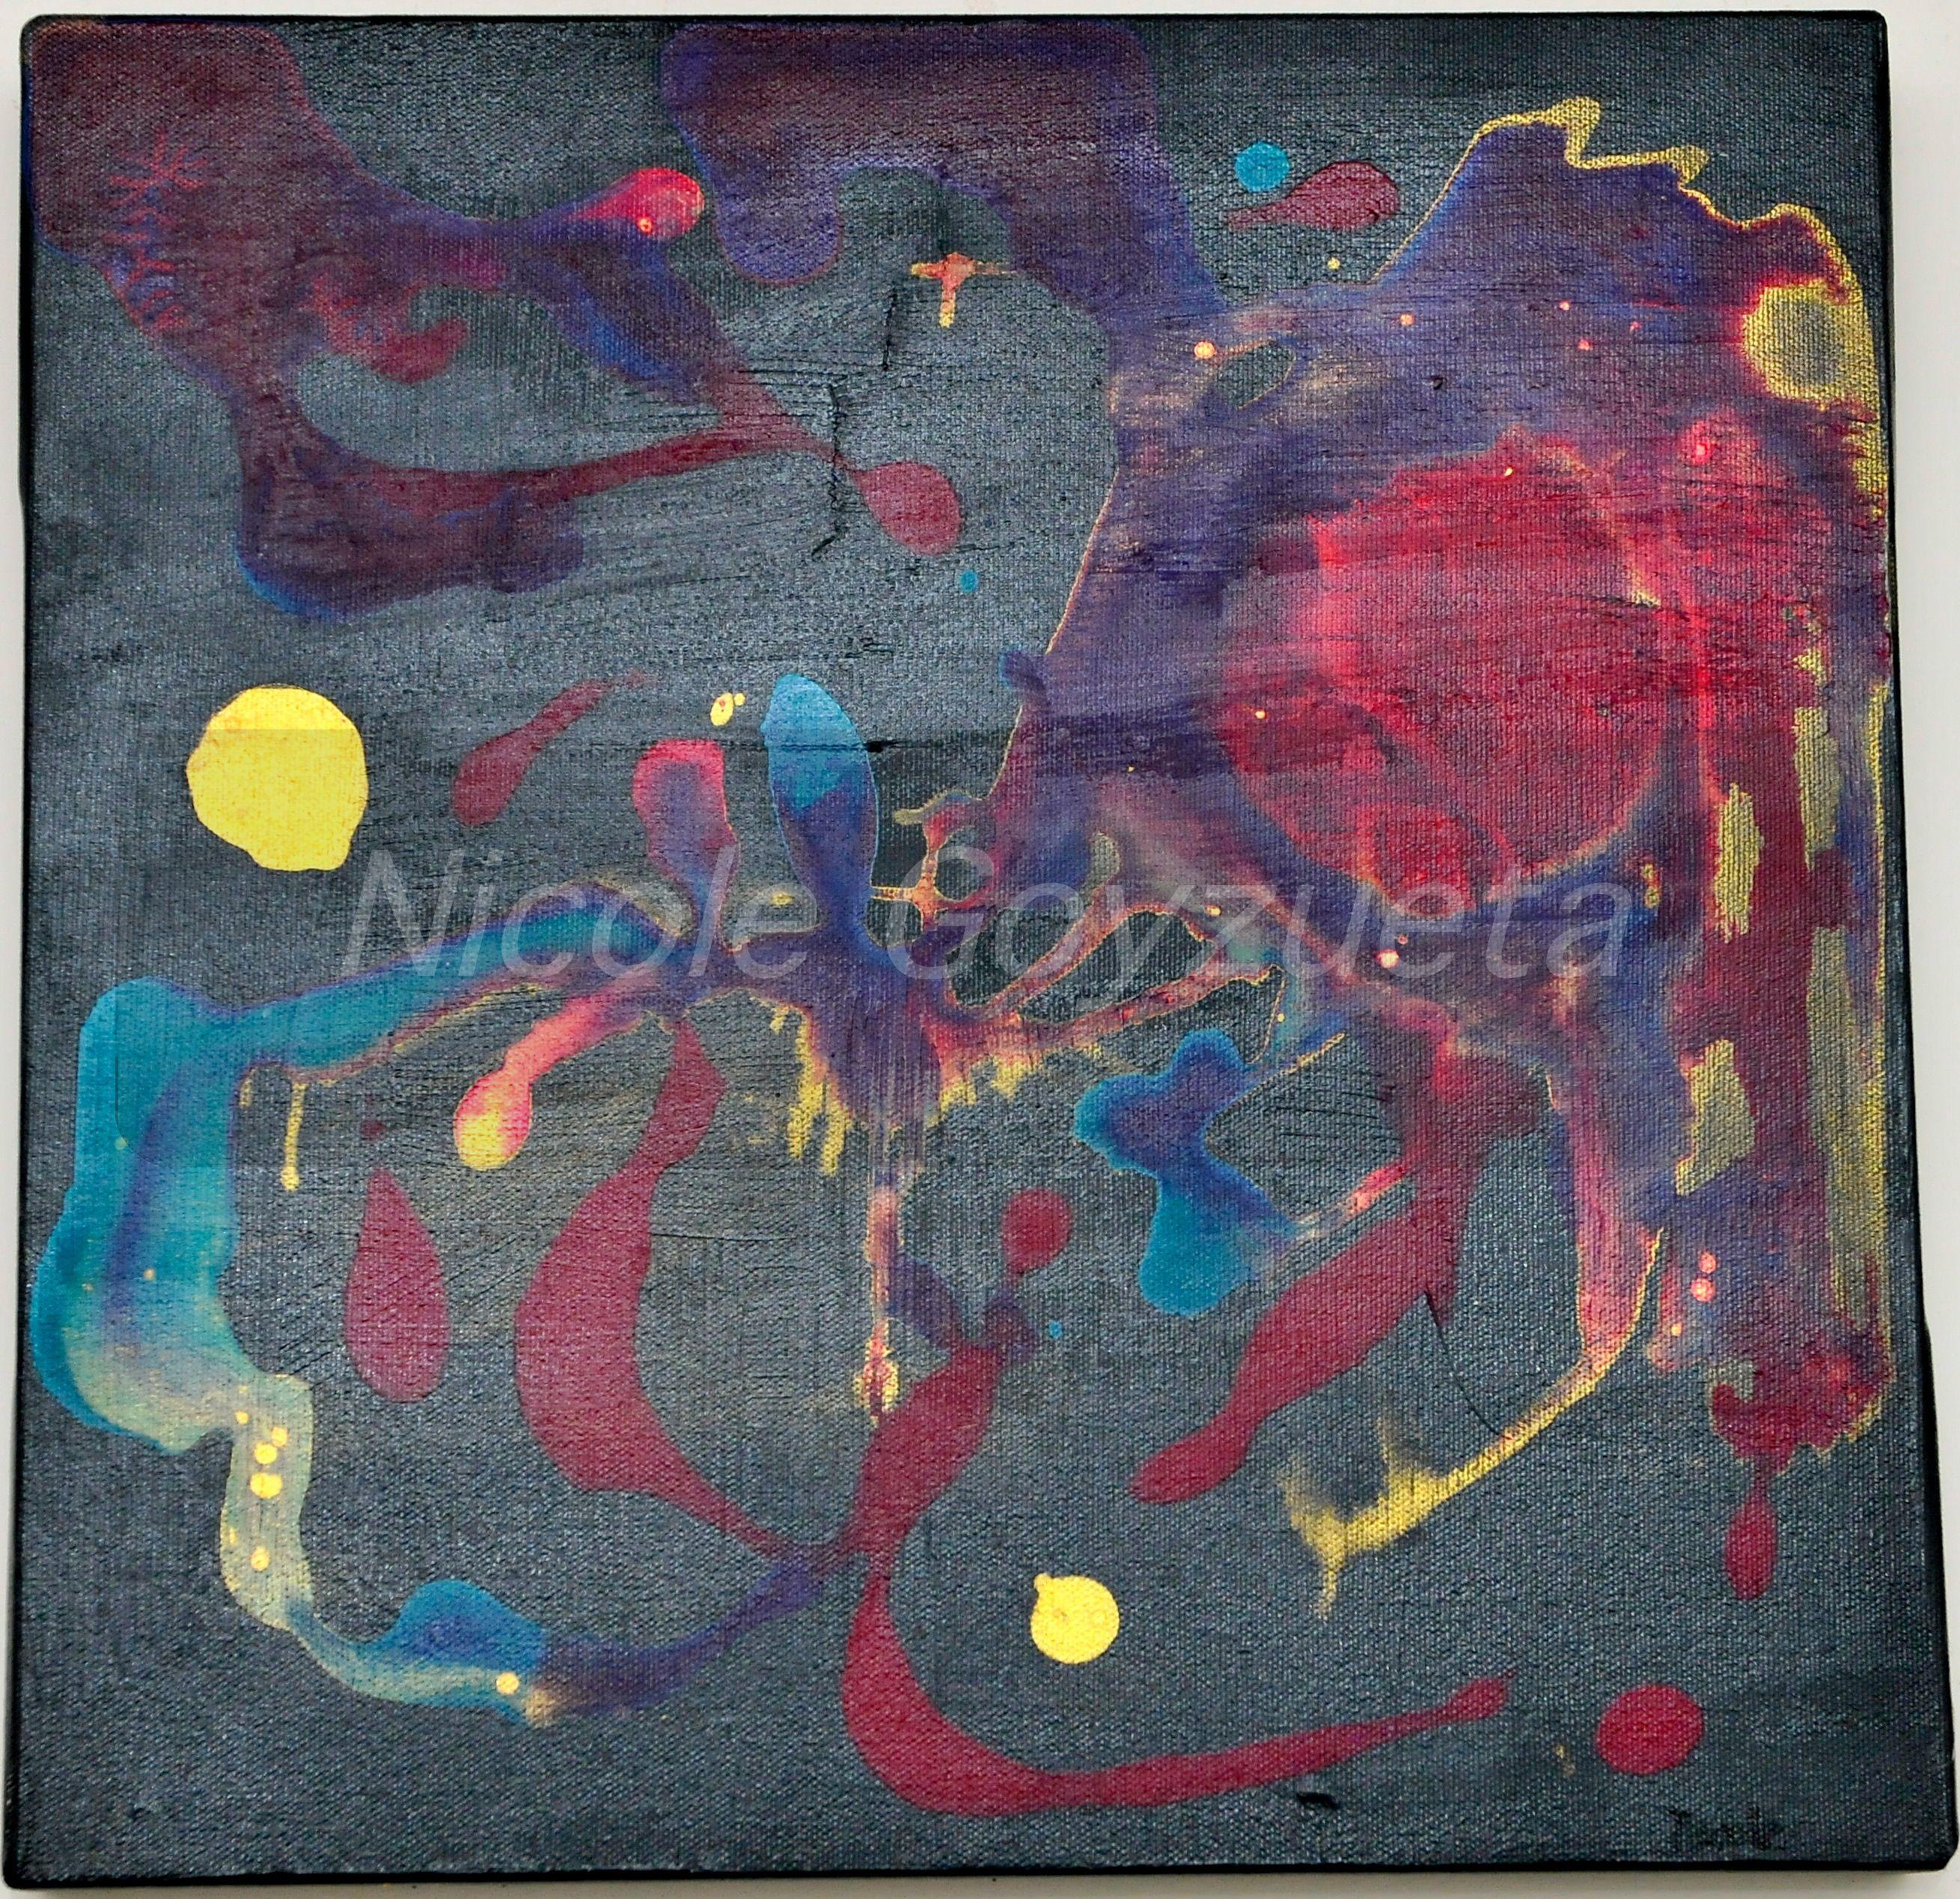 Blast 3... 12X12 acrylic on canvas.